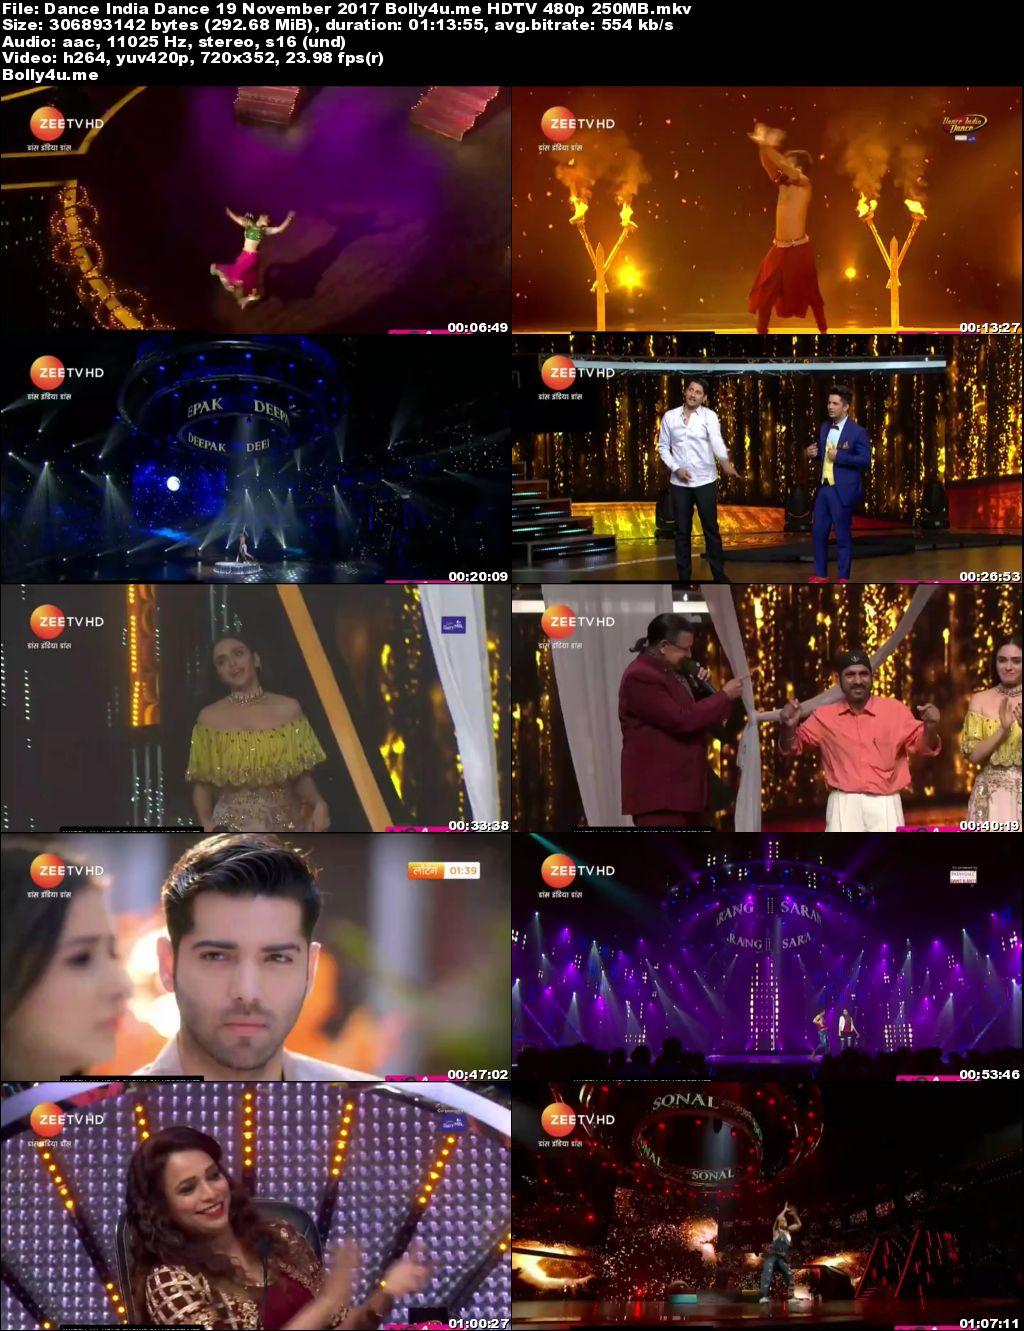 Dance India Dance HDTV 480p 250MB 19 November 2017 Download